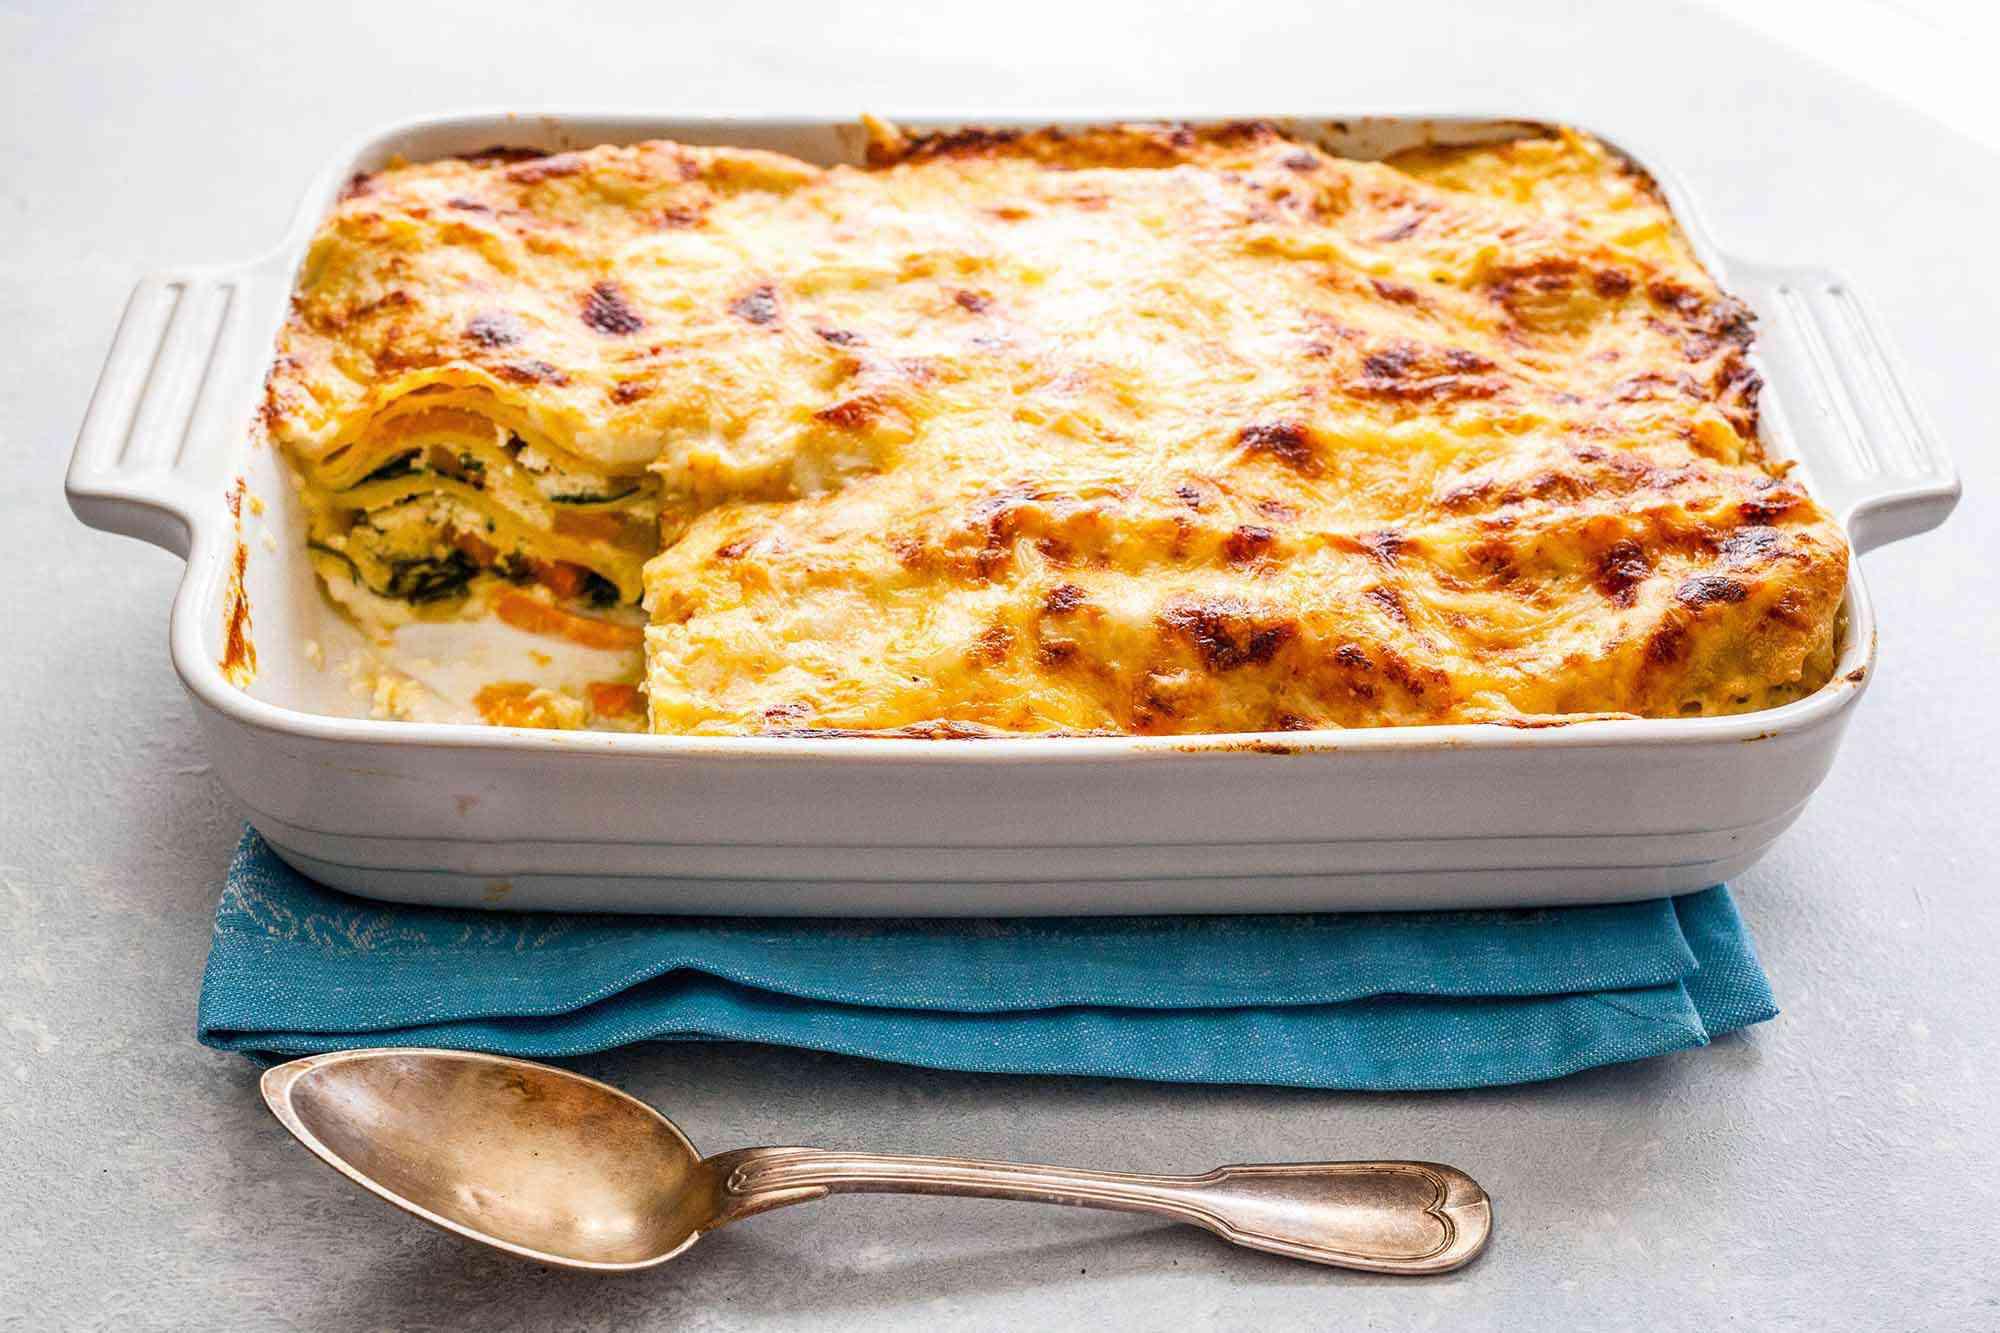 Vegetarian Lasagna Recipe bake until golden brown and bubbly